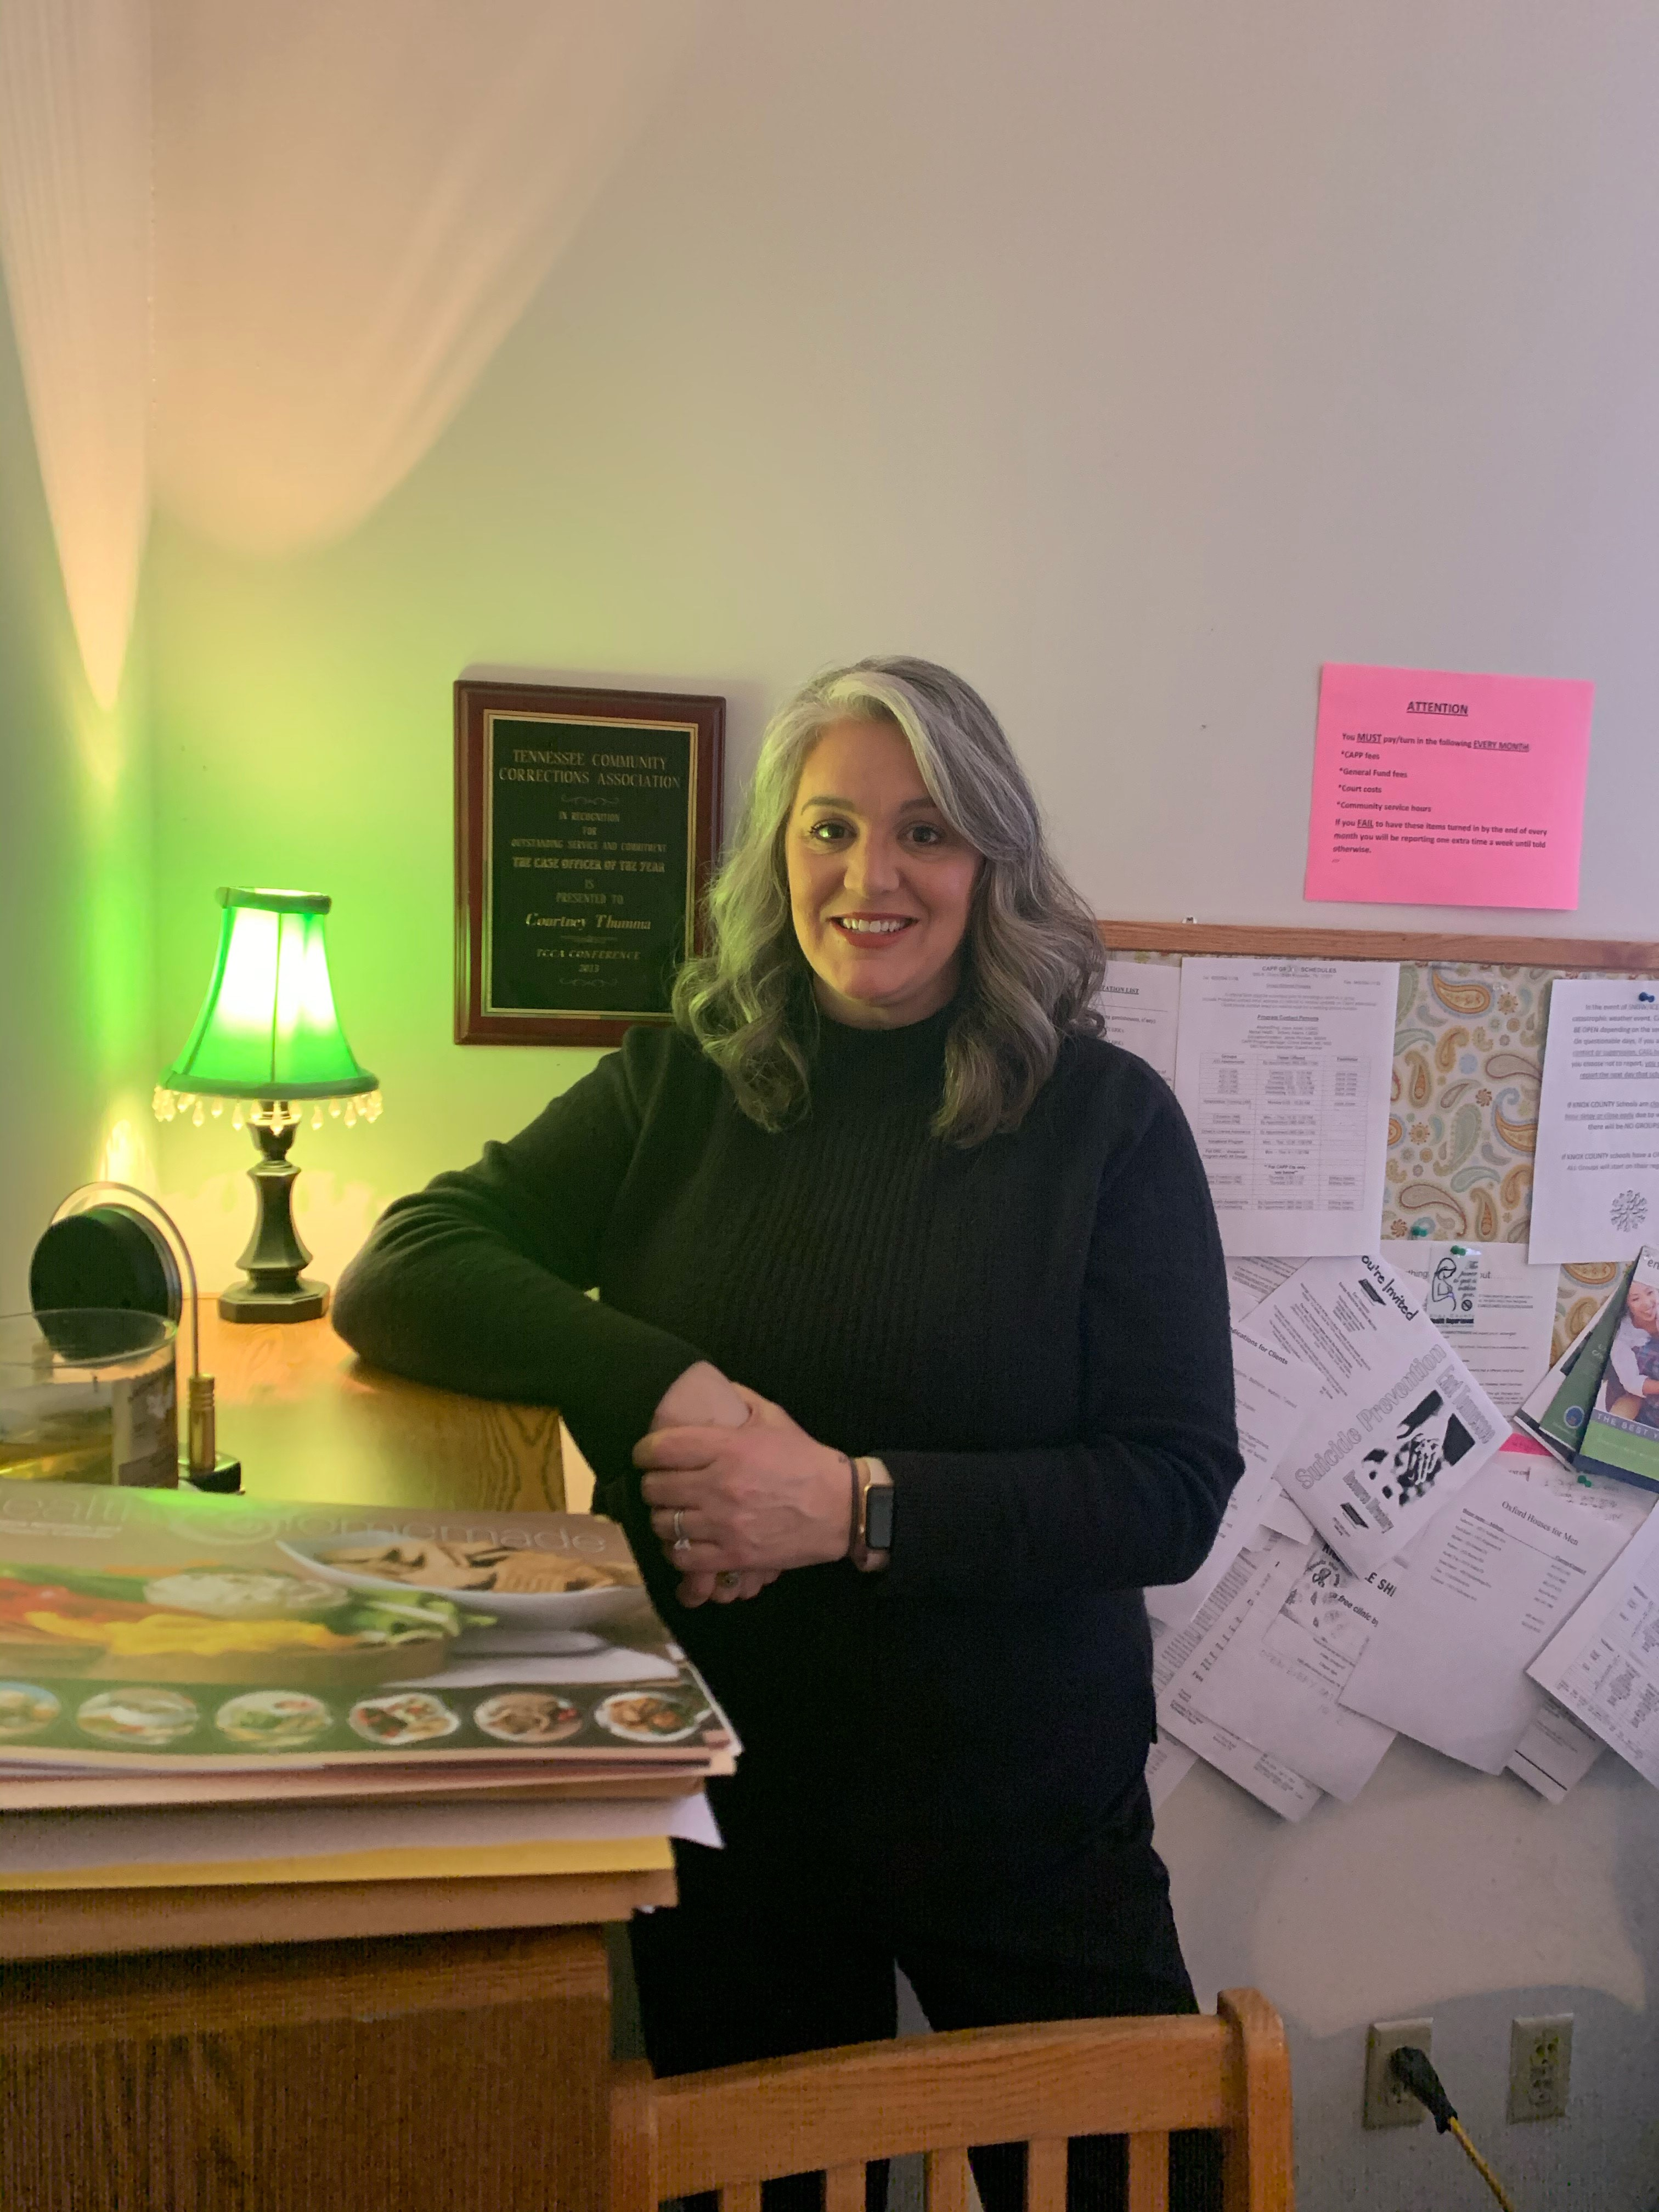 Courtney Thumma standing next to bookshelf